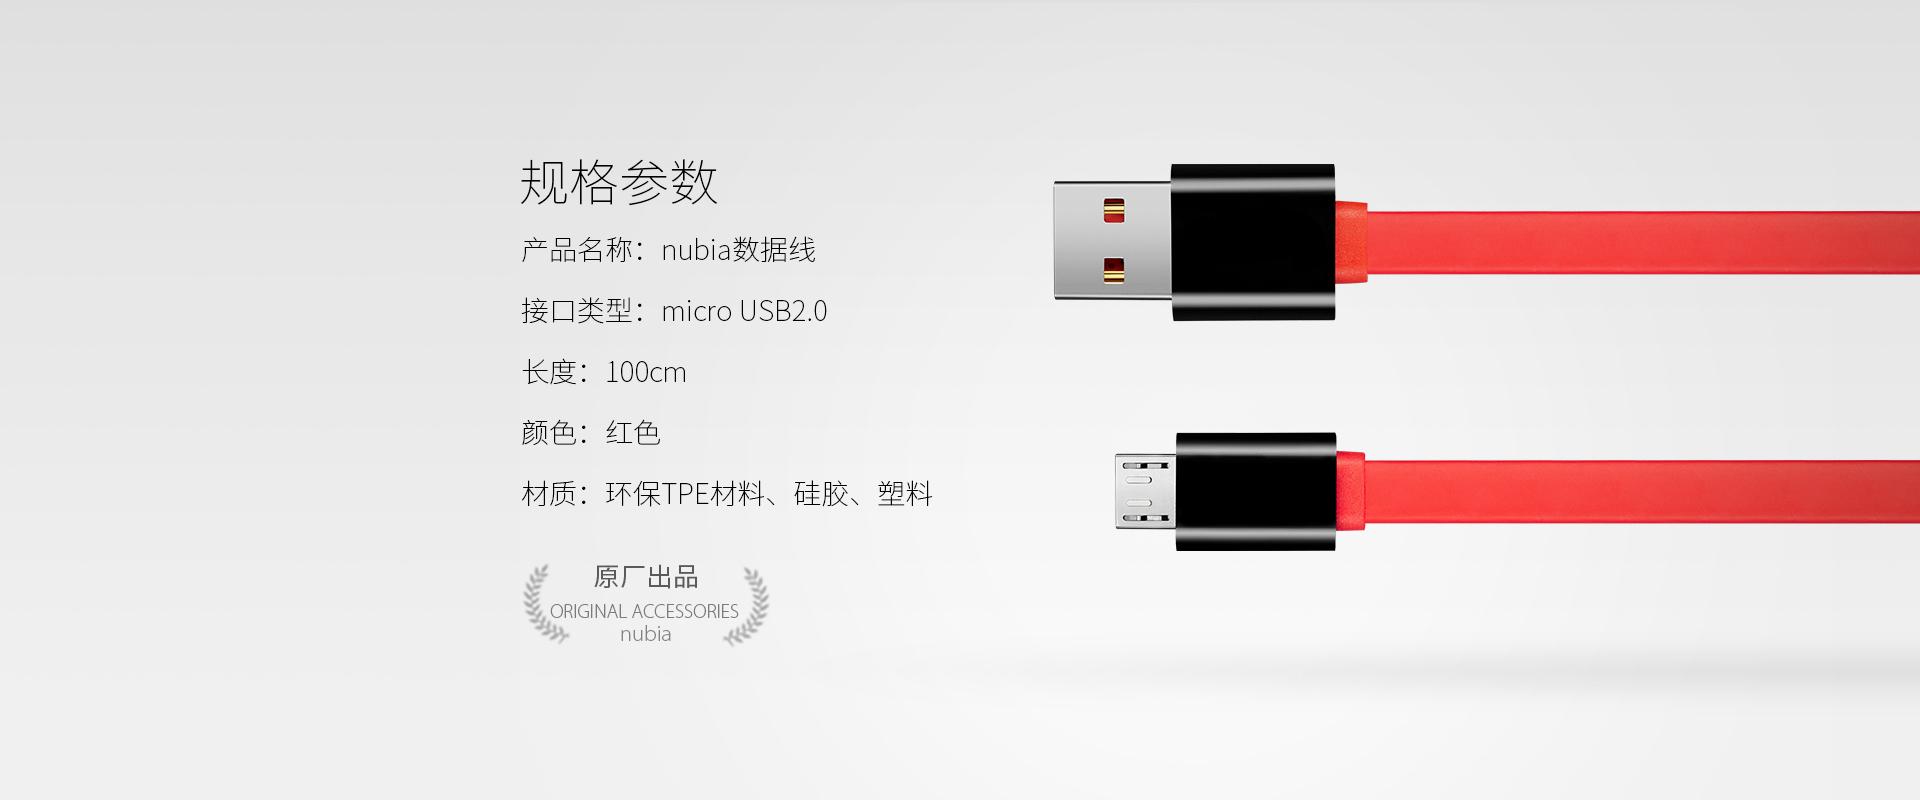 nubia micro USB 数据线